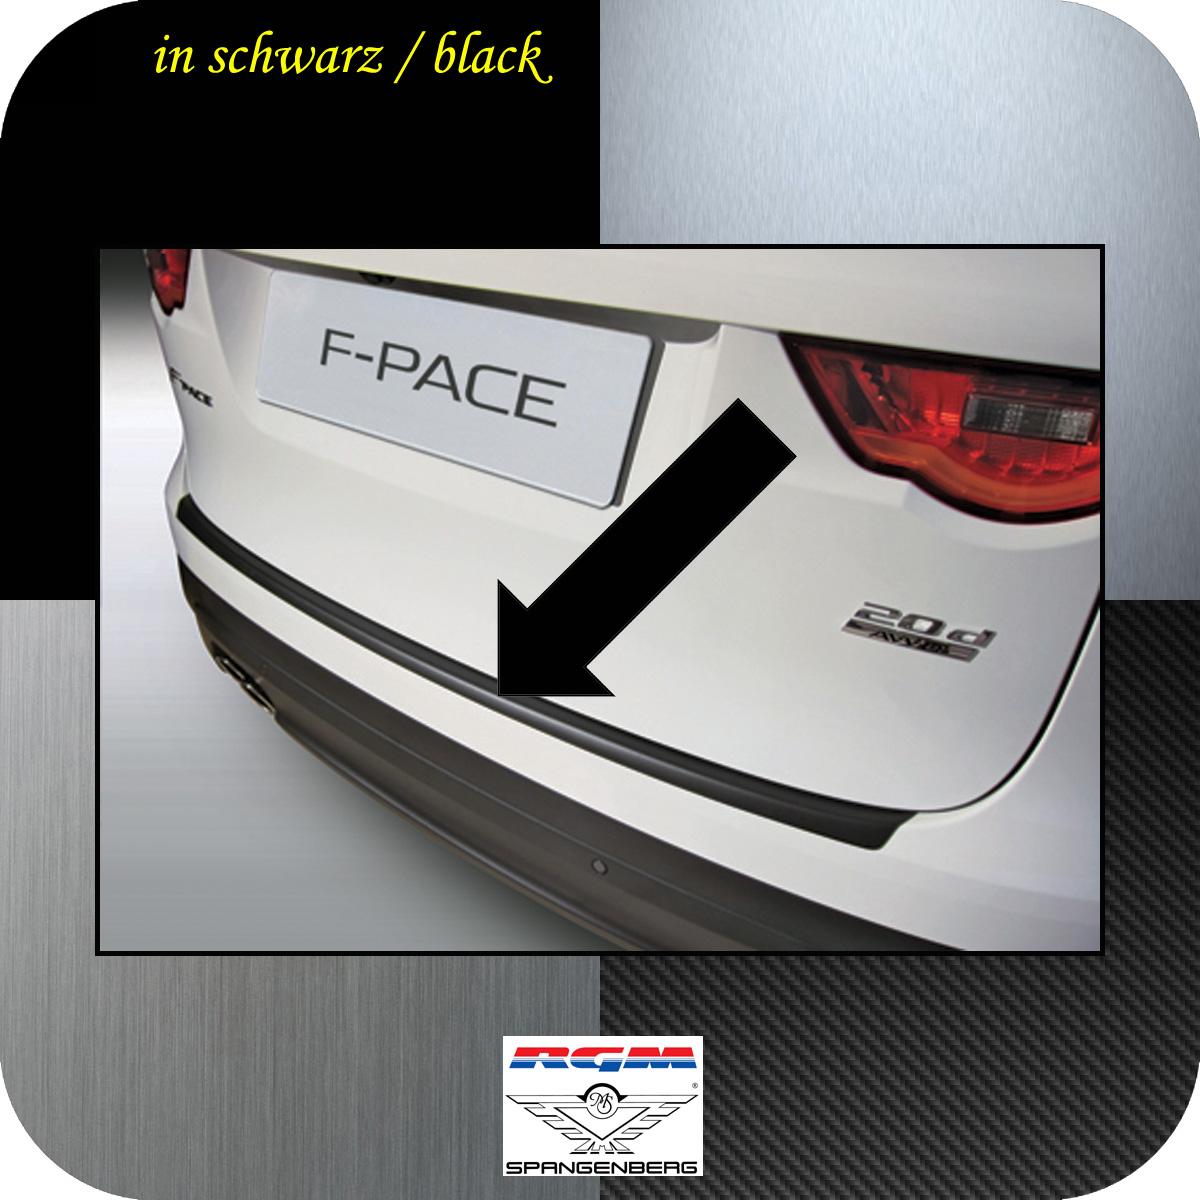 Ladekantenschutz schwarz Jaguar F-Pace SUV Kombi ab Baujahr 2015- 3500942